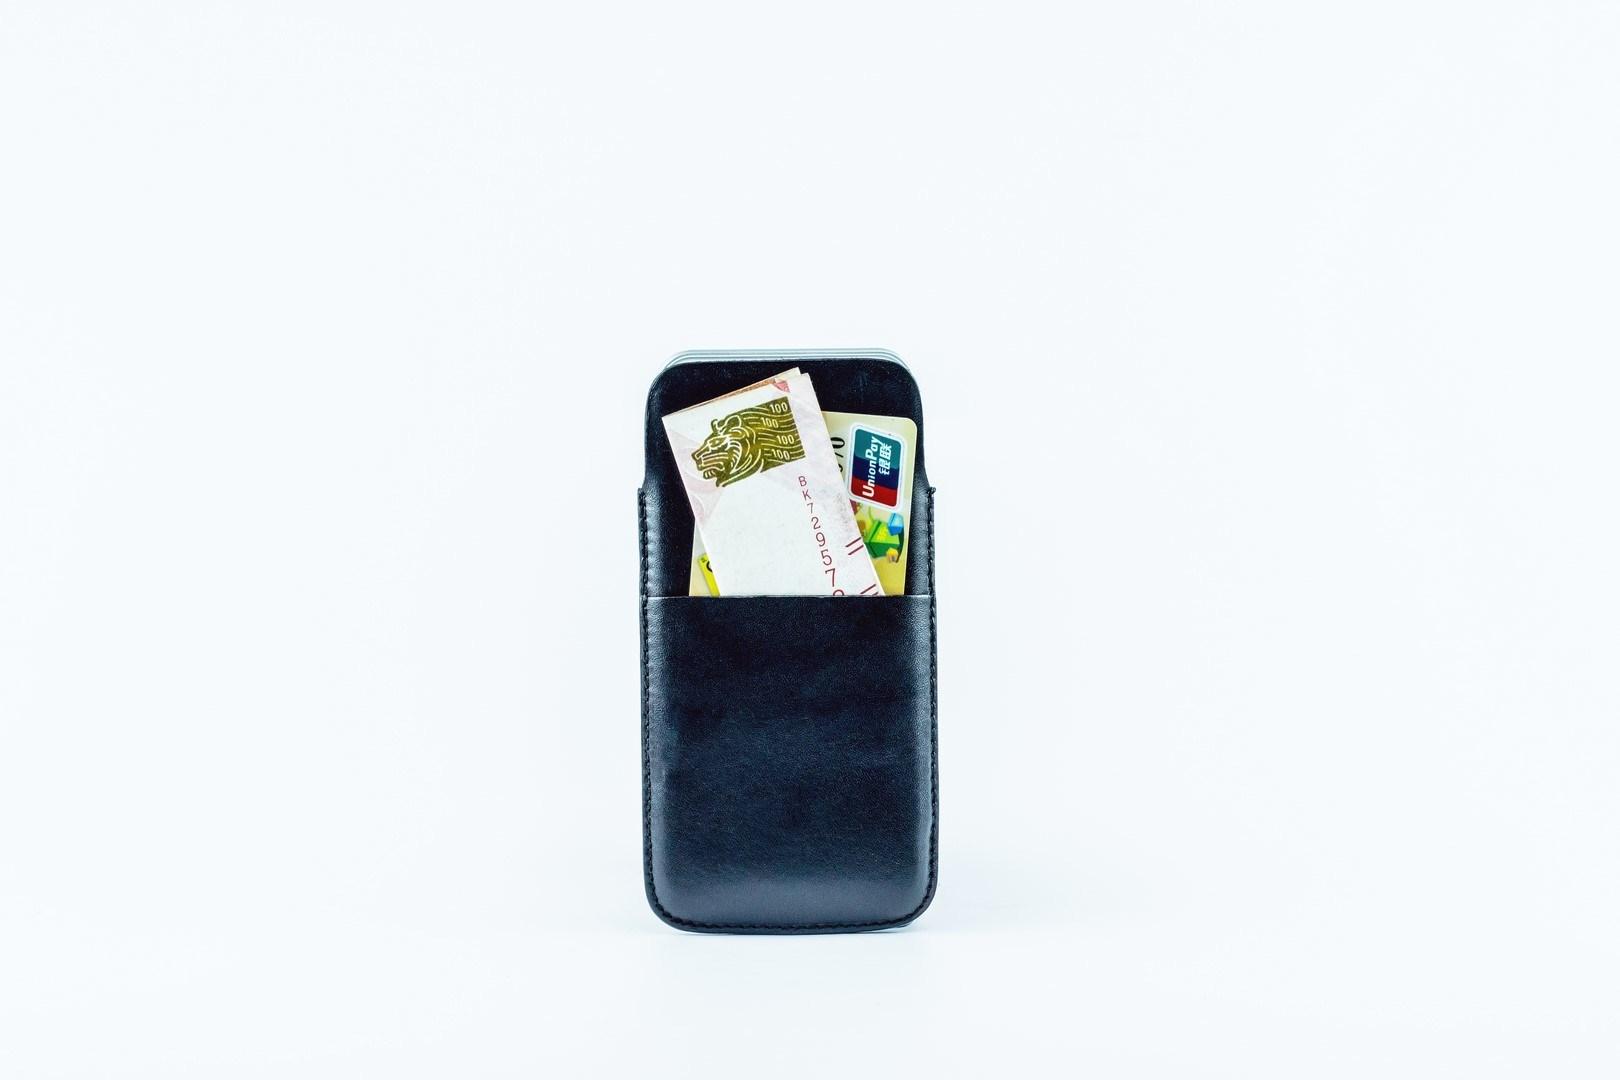 High Quality Pure 100% Handmade Mobilephone Sets/Holder